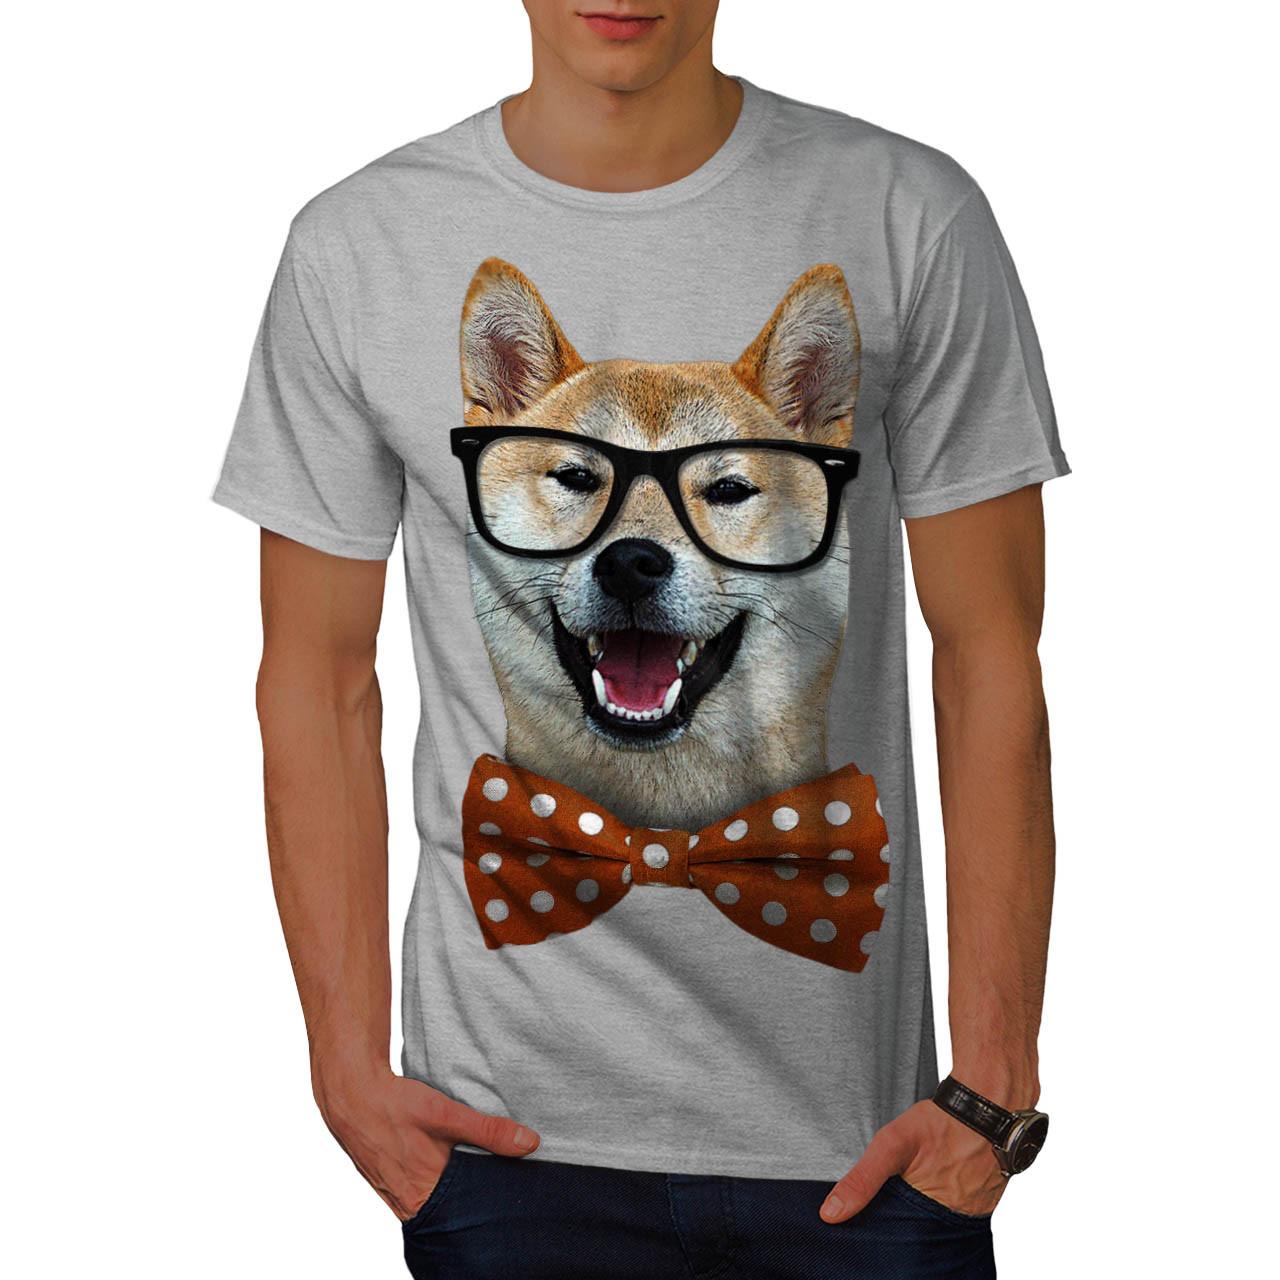 smart-shiba-inu-dog-t-shirt-design-front